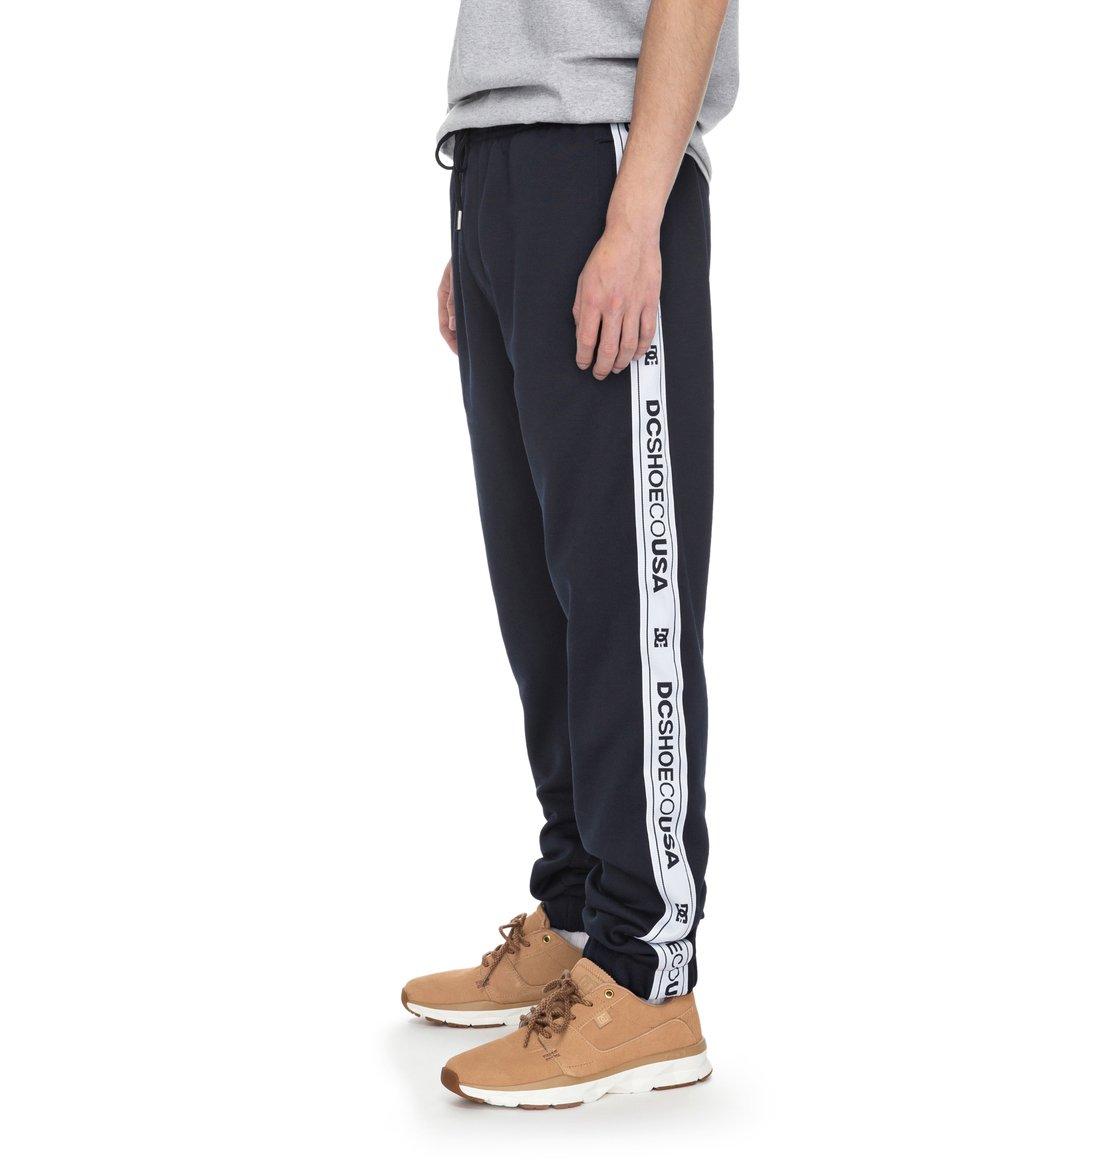 Burdons pantalon de jogging rayures lat rales edyfb03042 dc shoes - Pantalon bande laterale homme ...